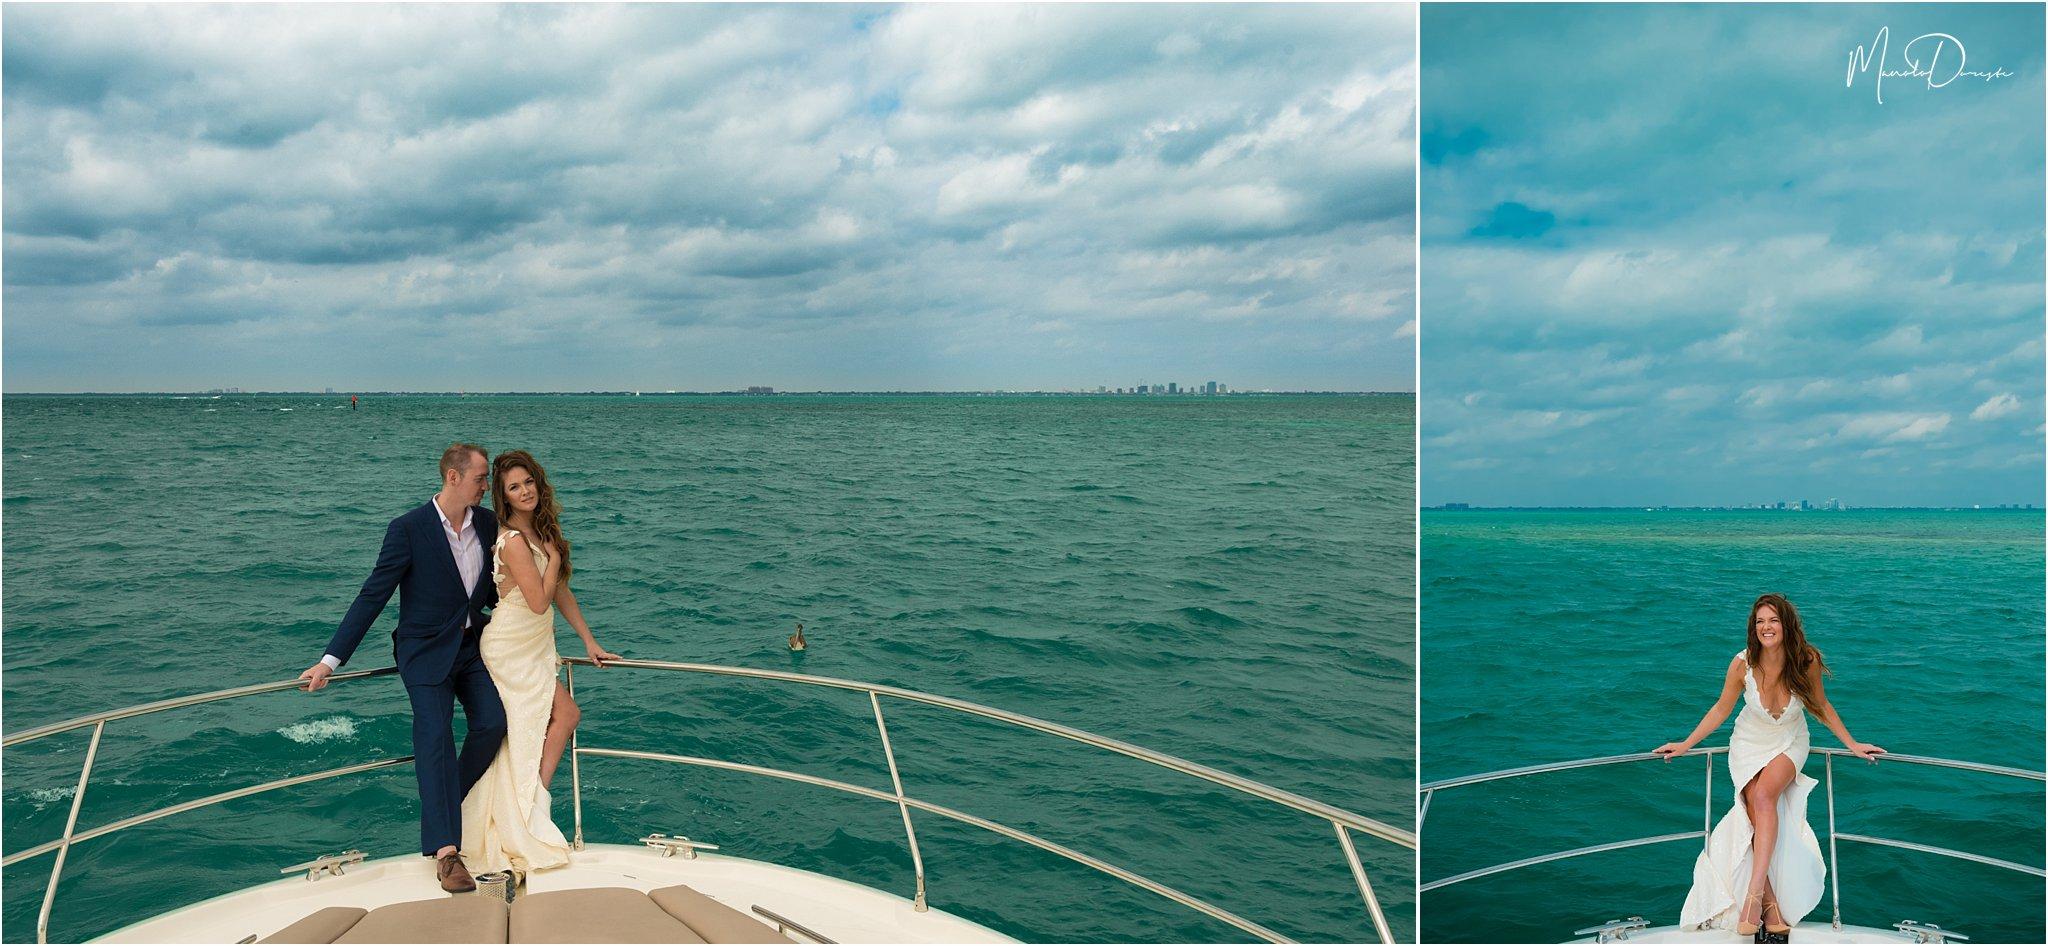 00899_ManoloDoreste_InFocusStudios_Wedding_Family_Photography_Miami_MiamiPhotographer.jpg